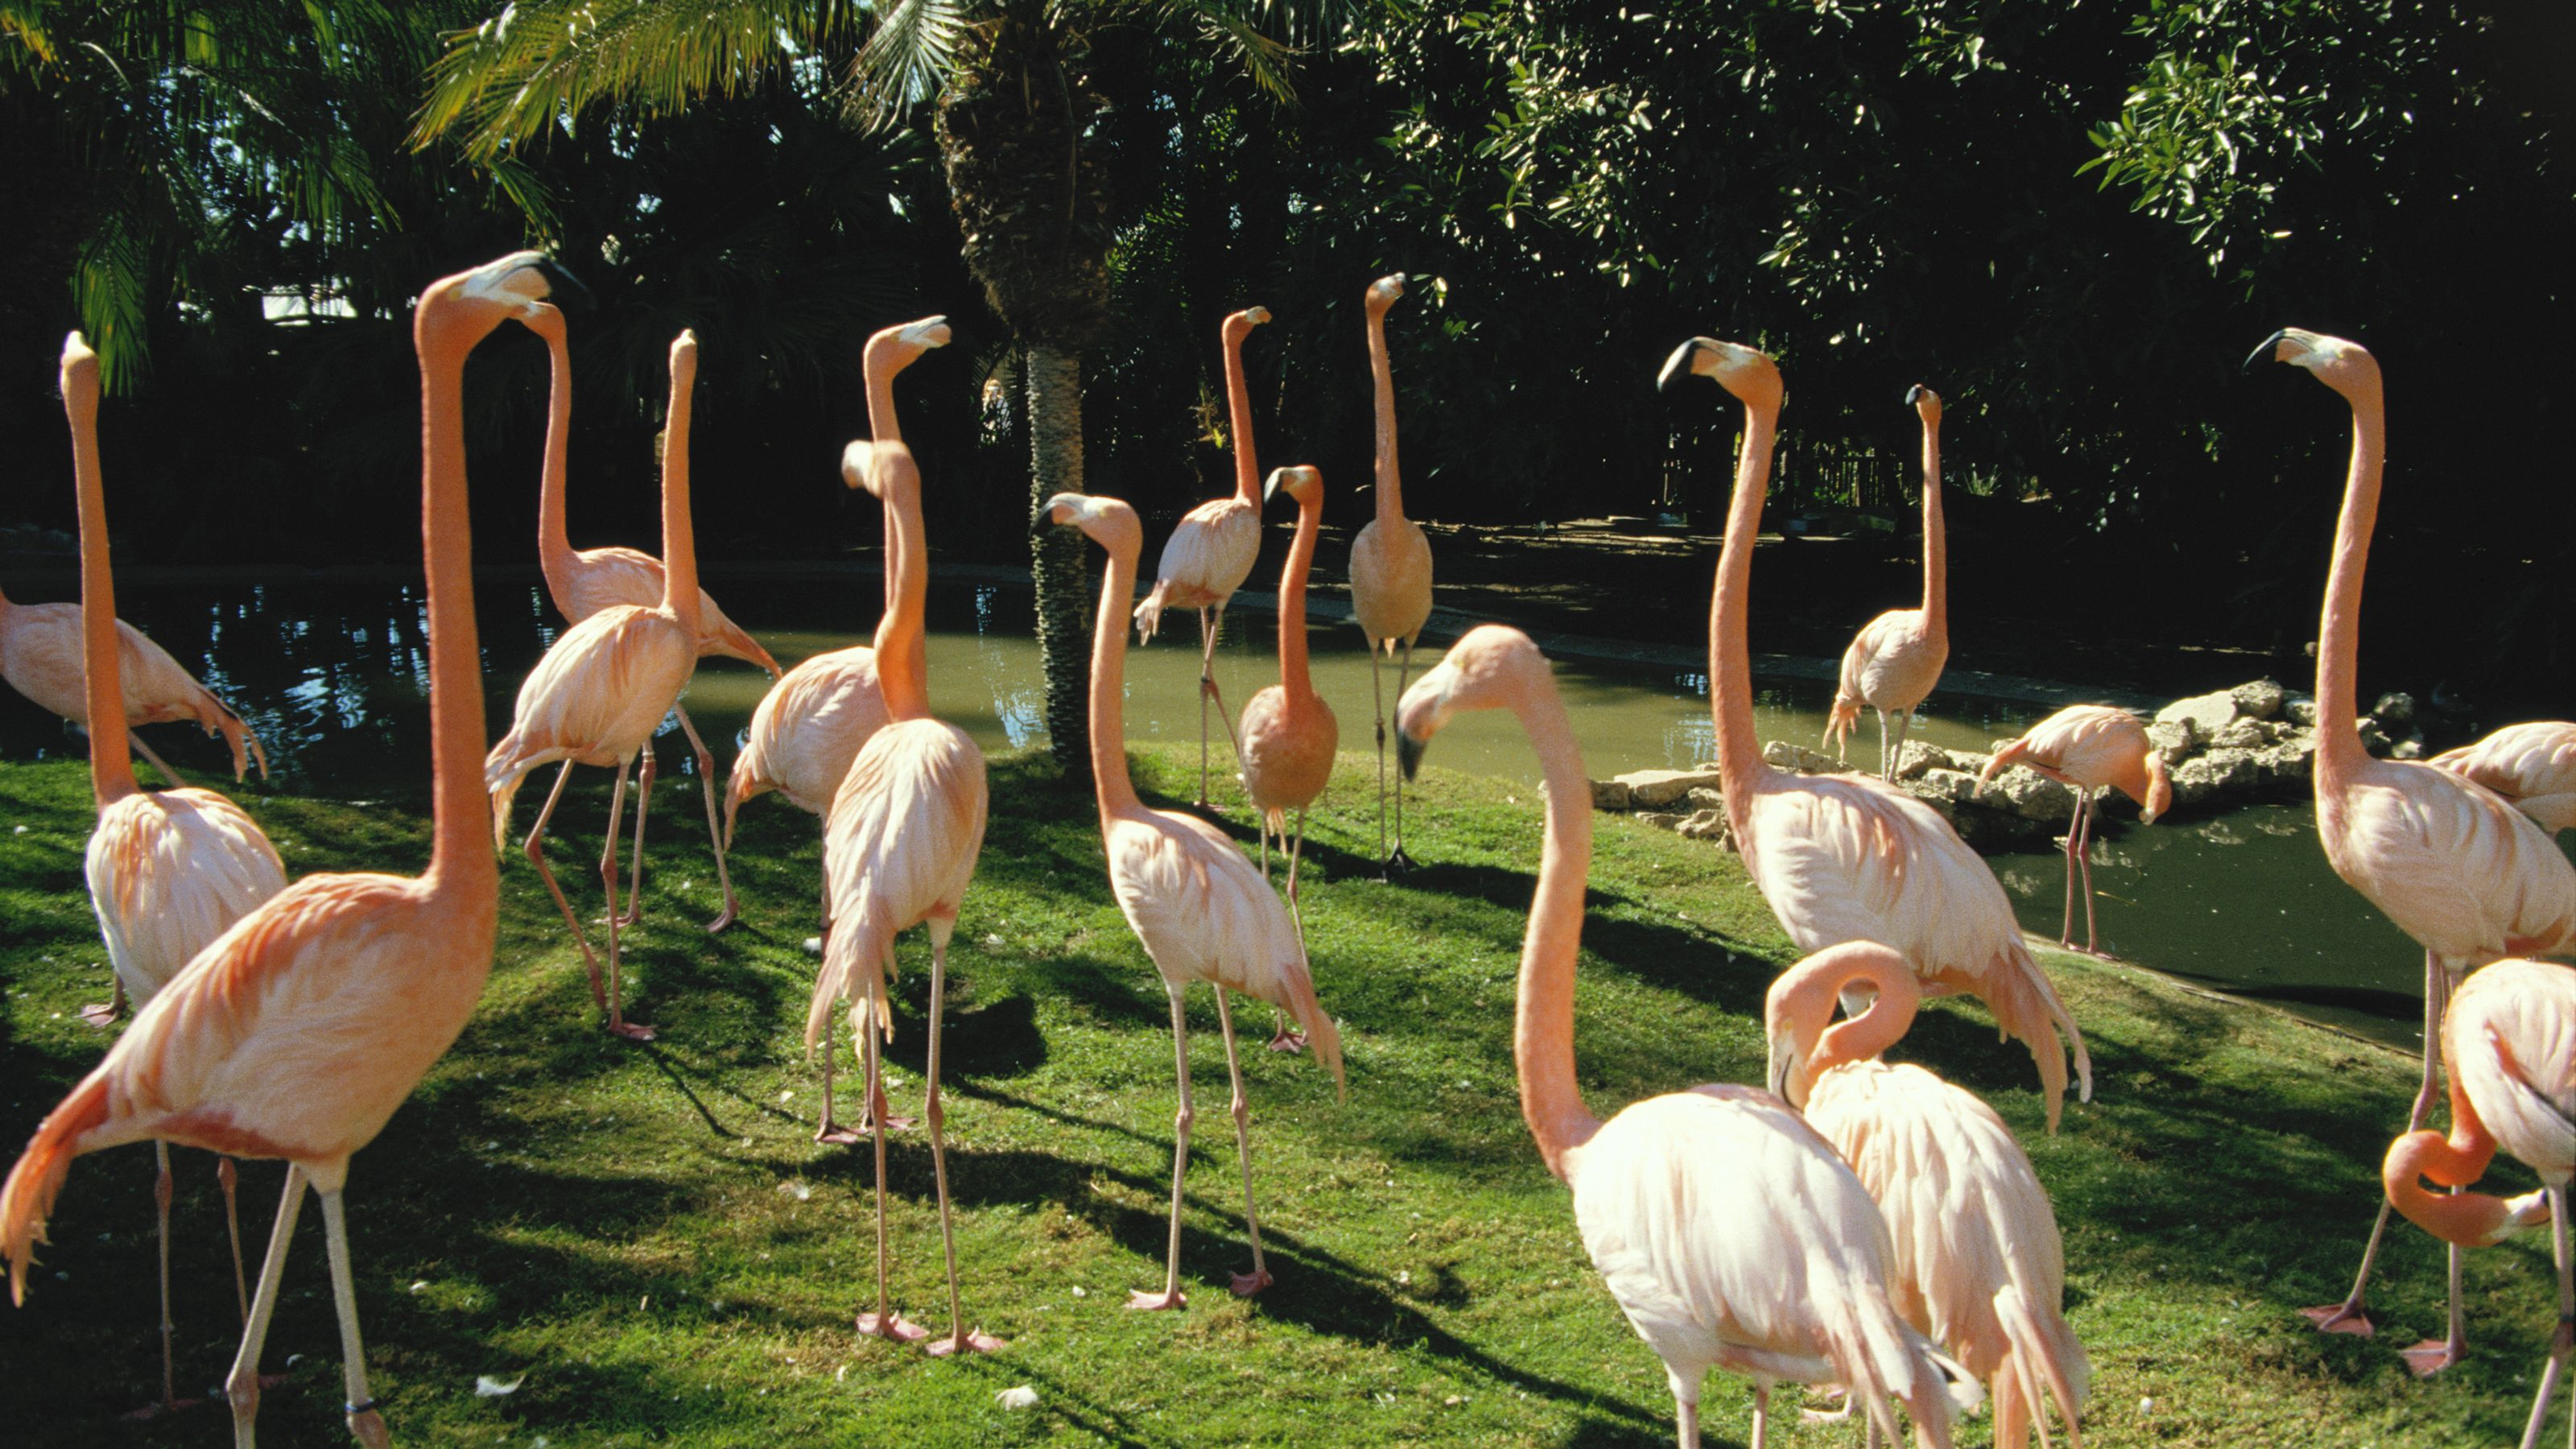 Flamingos at the singapore zoo